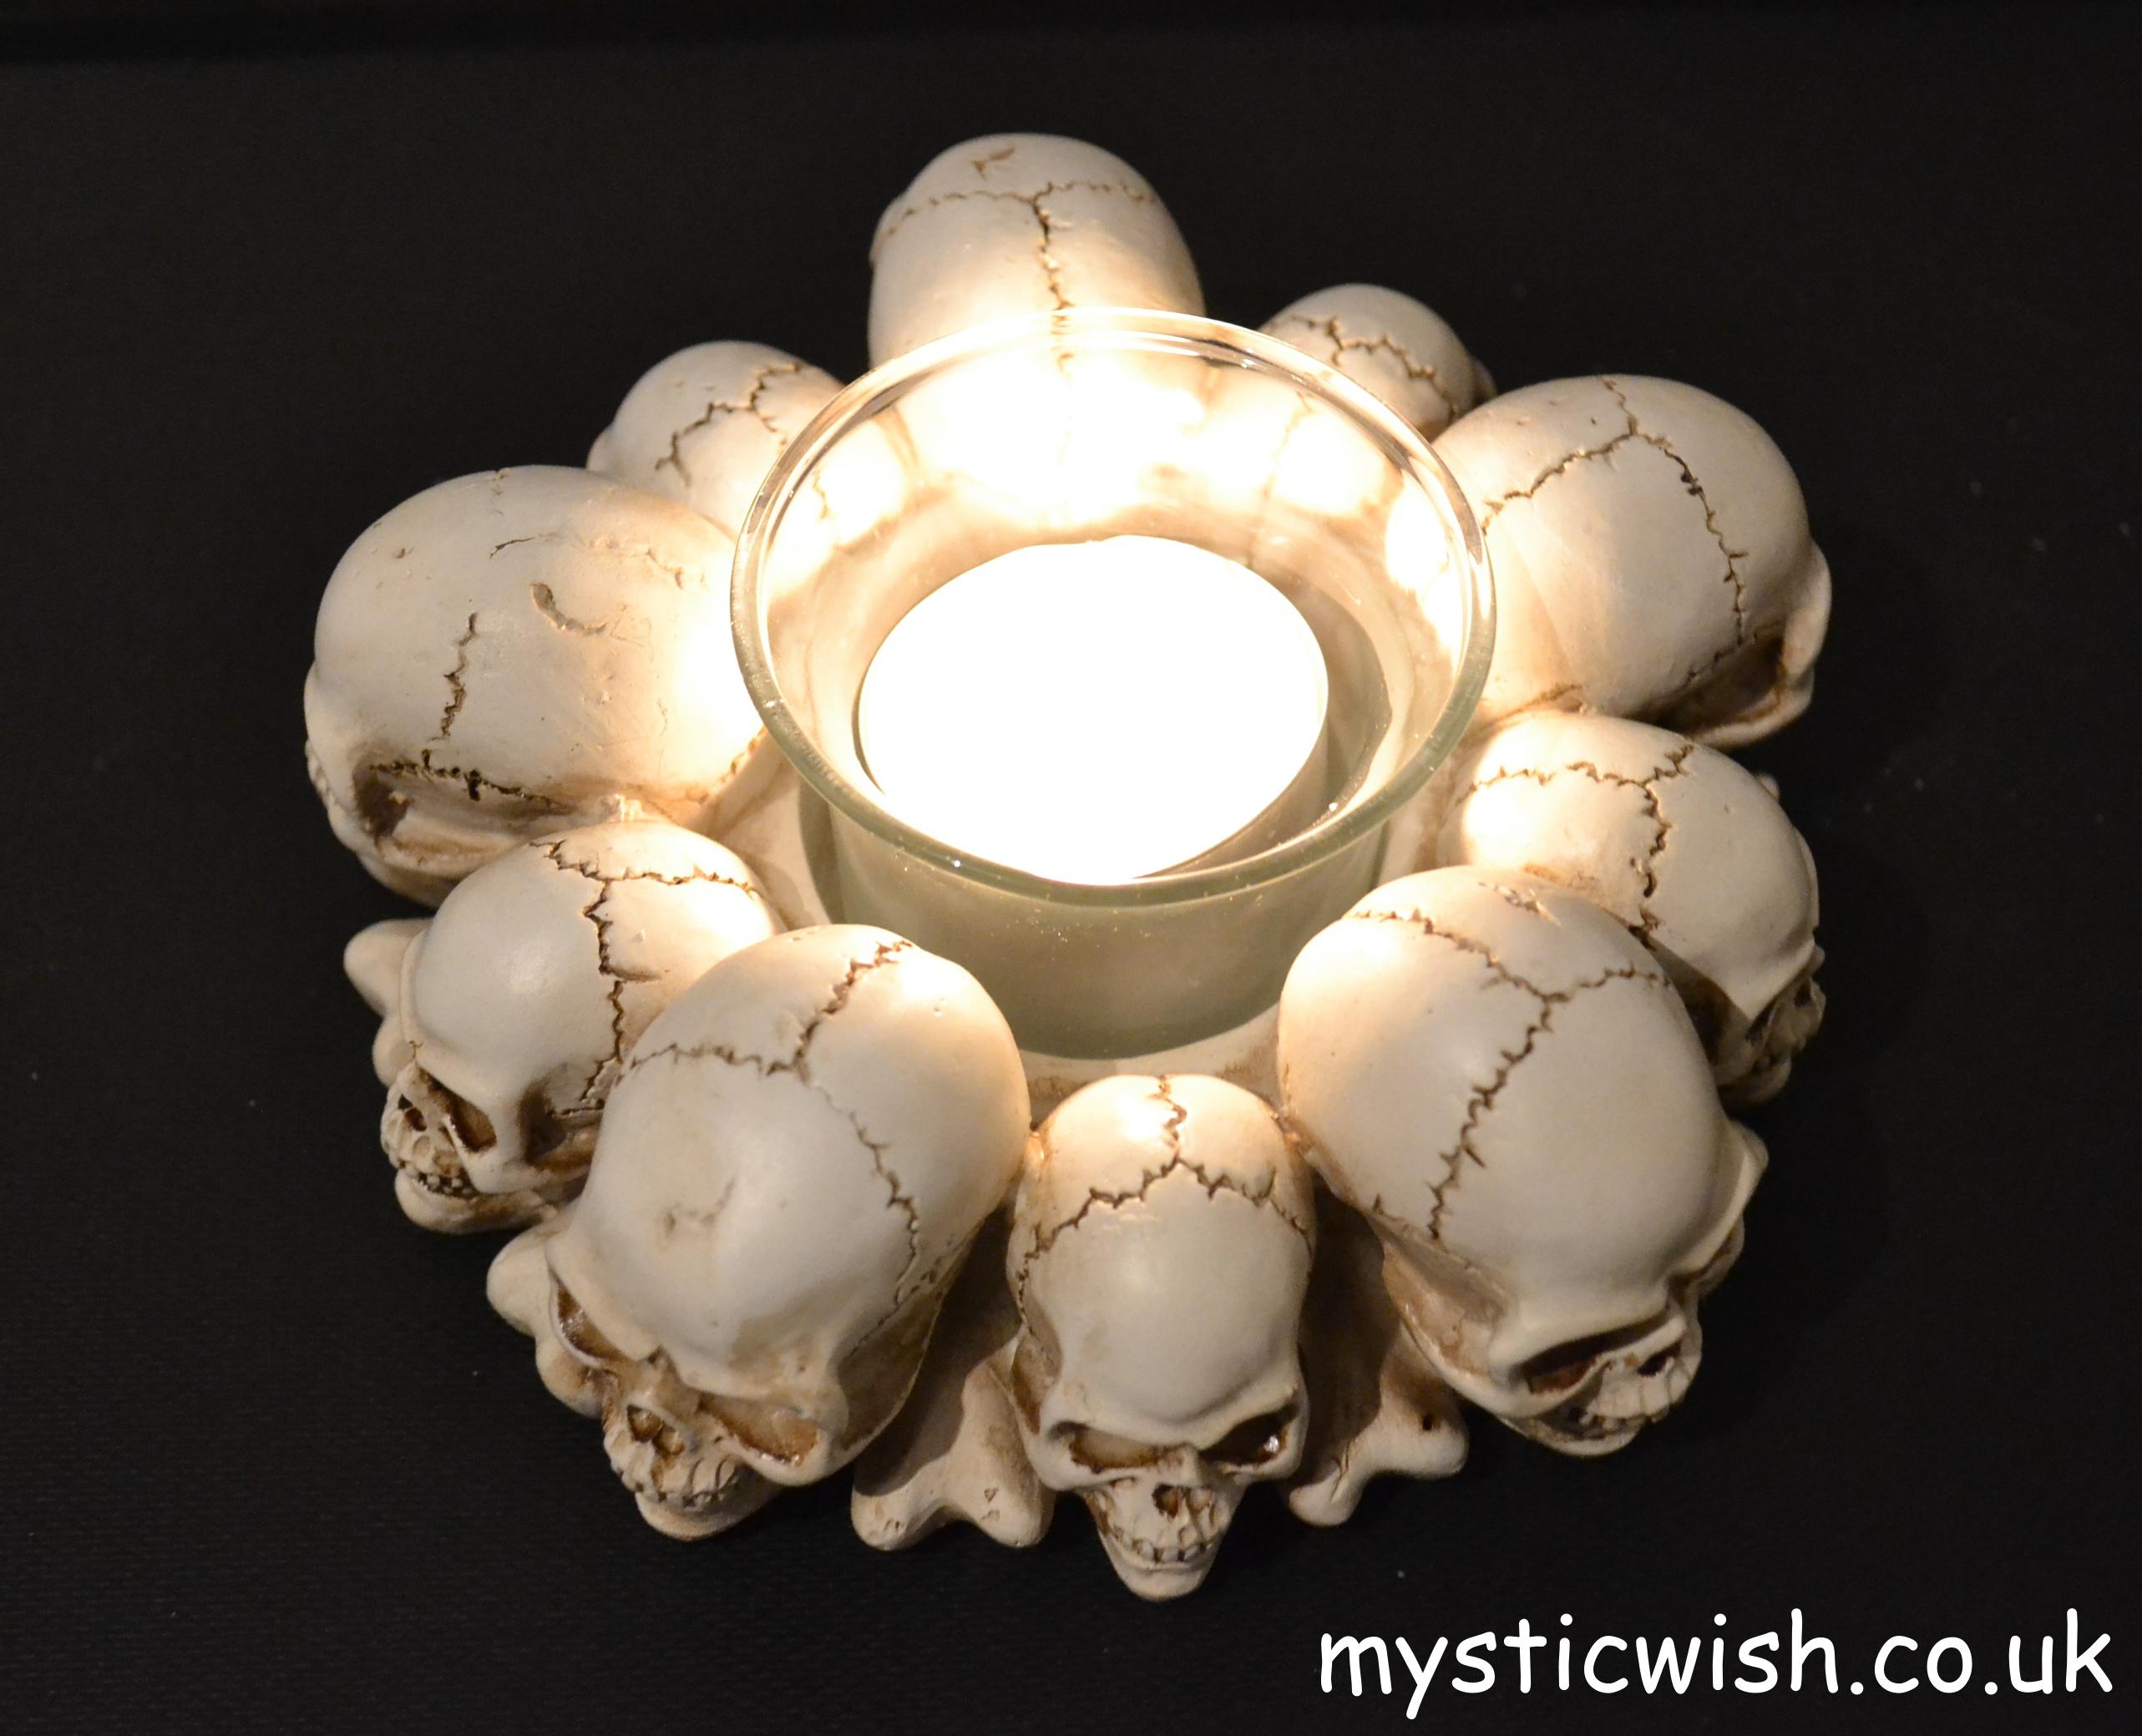 Skull Head Candle Holder Mystic Wish